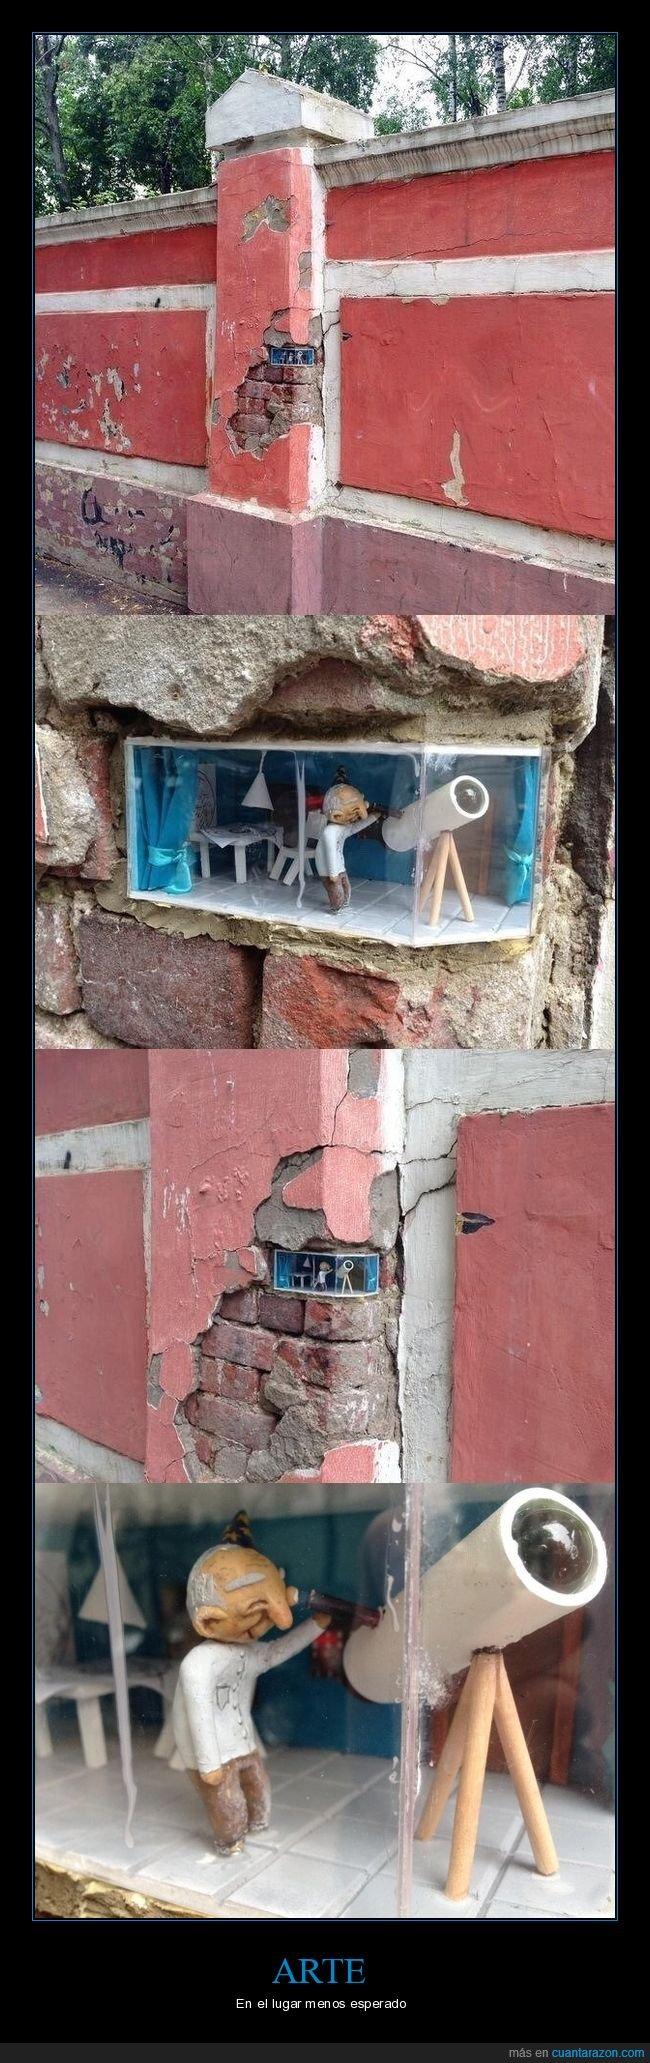 arte,ladrillos,wtf